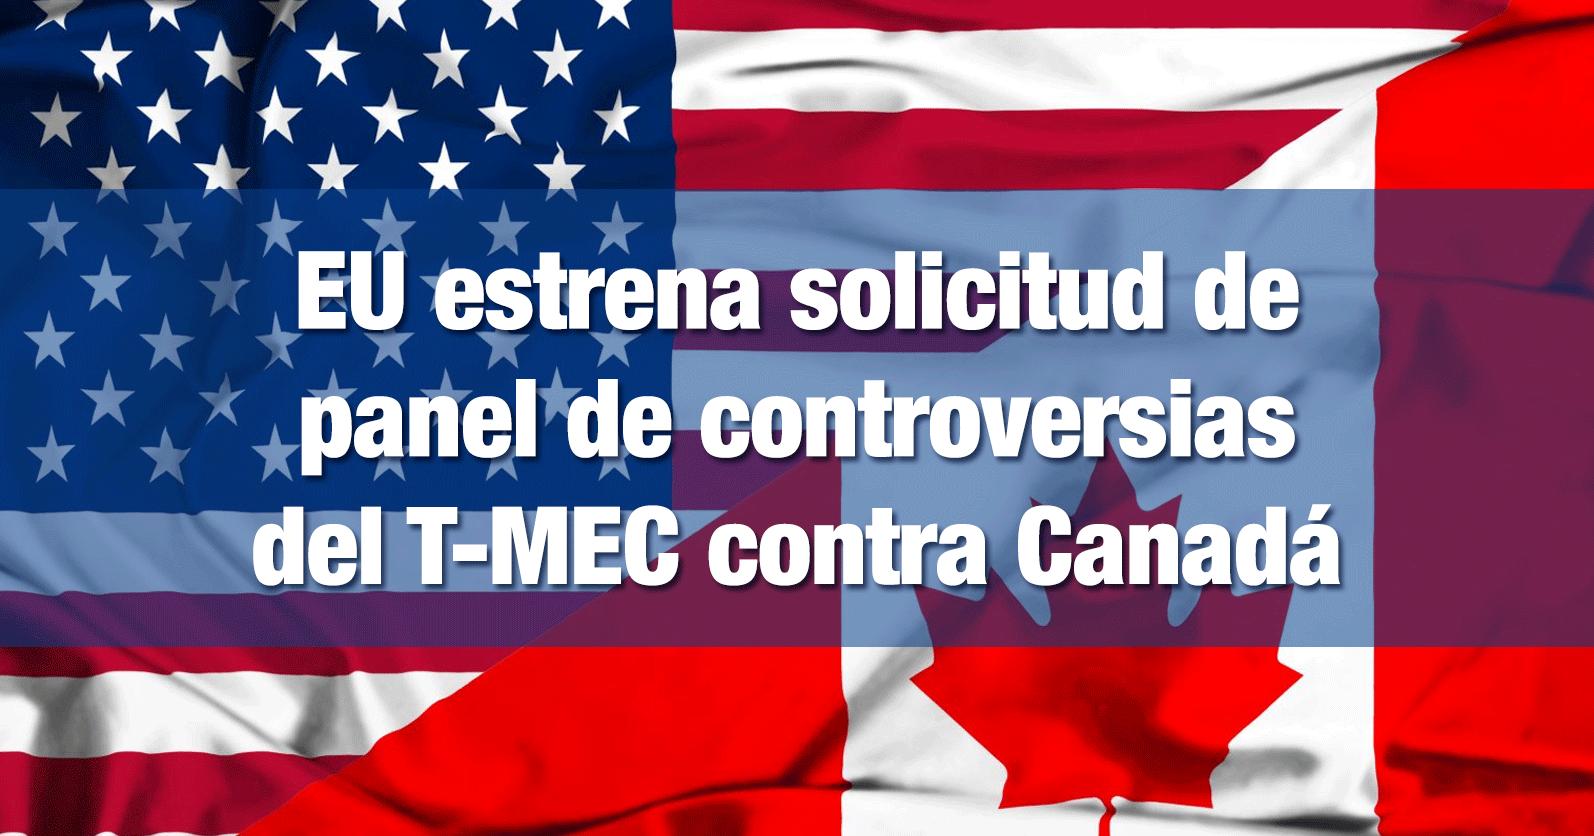 EU estrena solicitud de panel de controversias del T-MEC contra Canadá